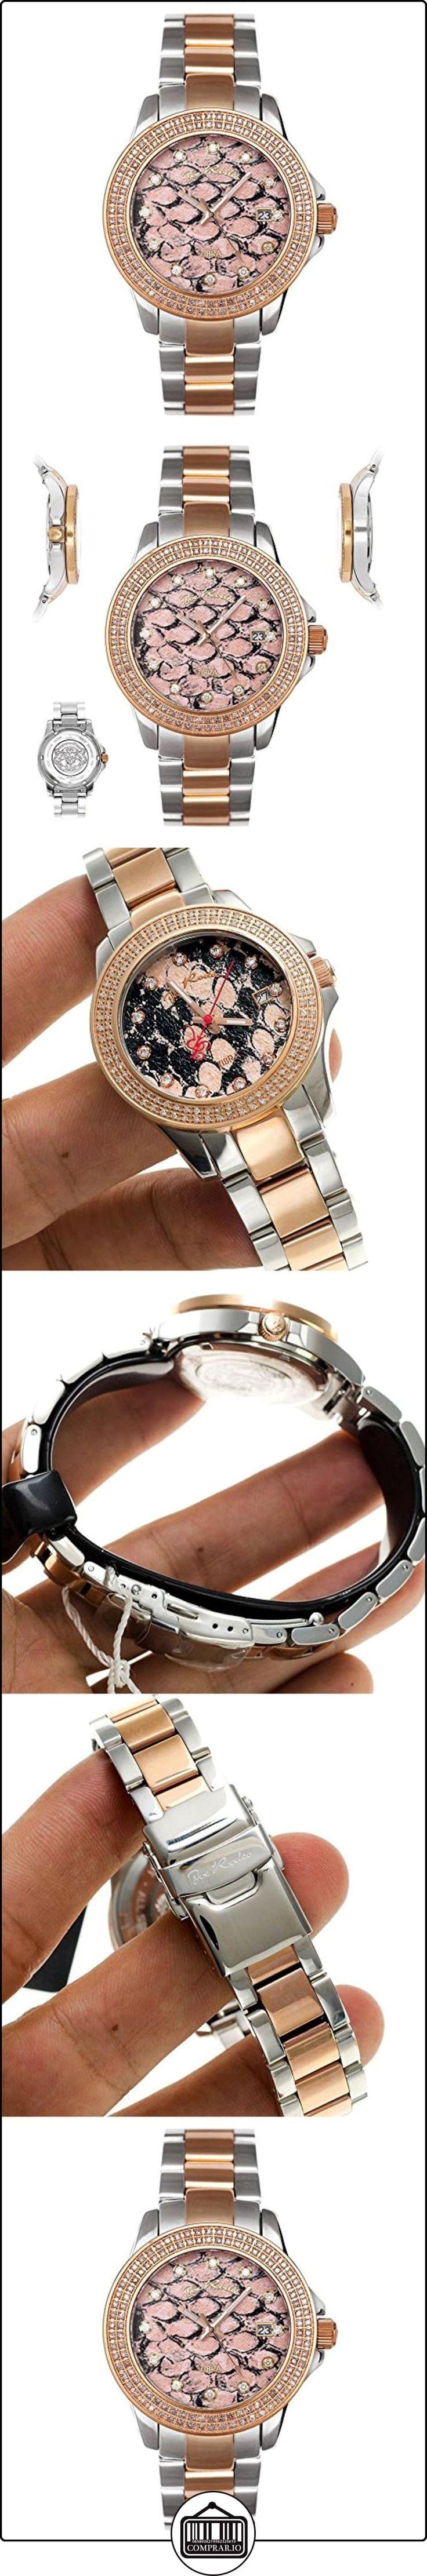 JOE RODEO Diamond Ladies Watch-zibra Rose Gold 1.25quilates de  ✿ Relojes para mujer - (Lujo) ✿